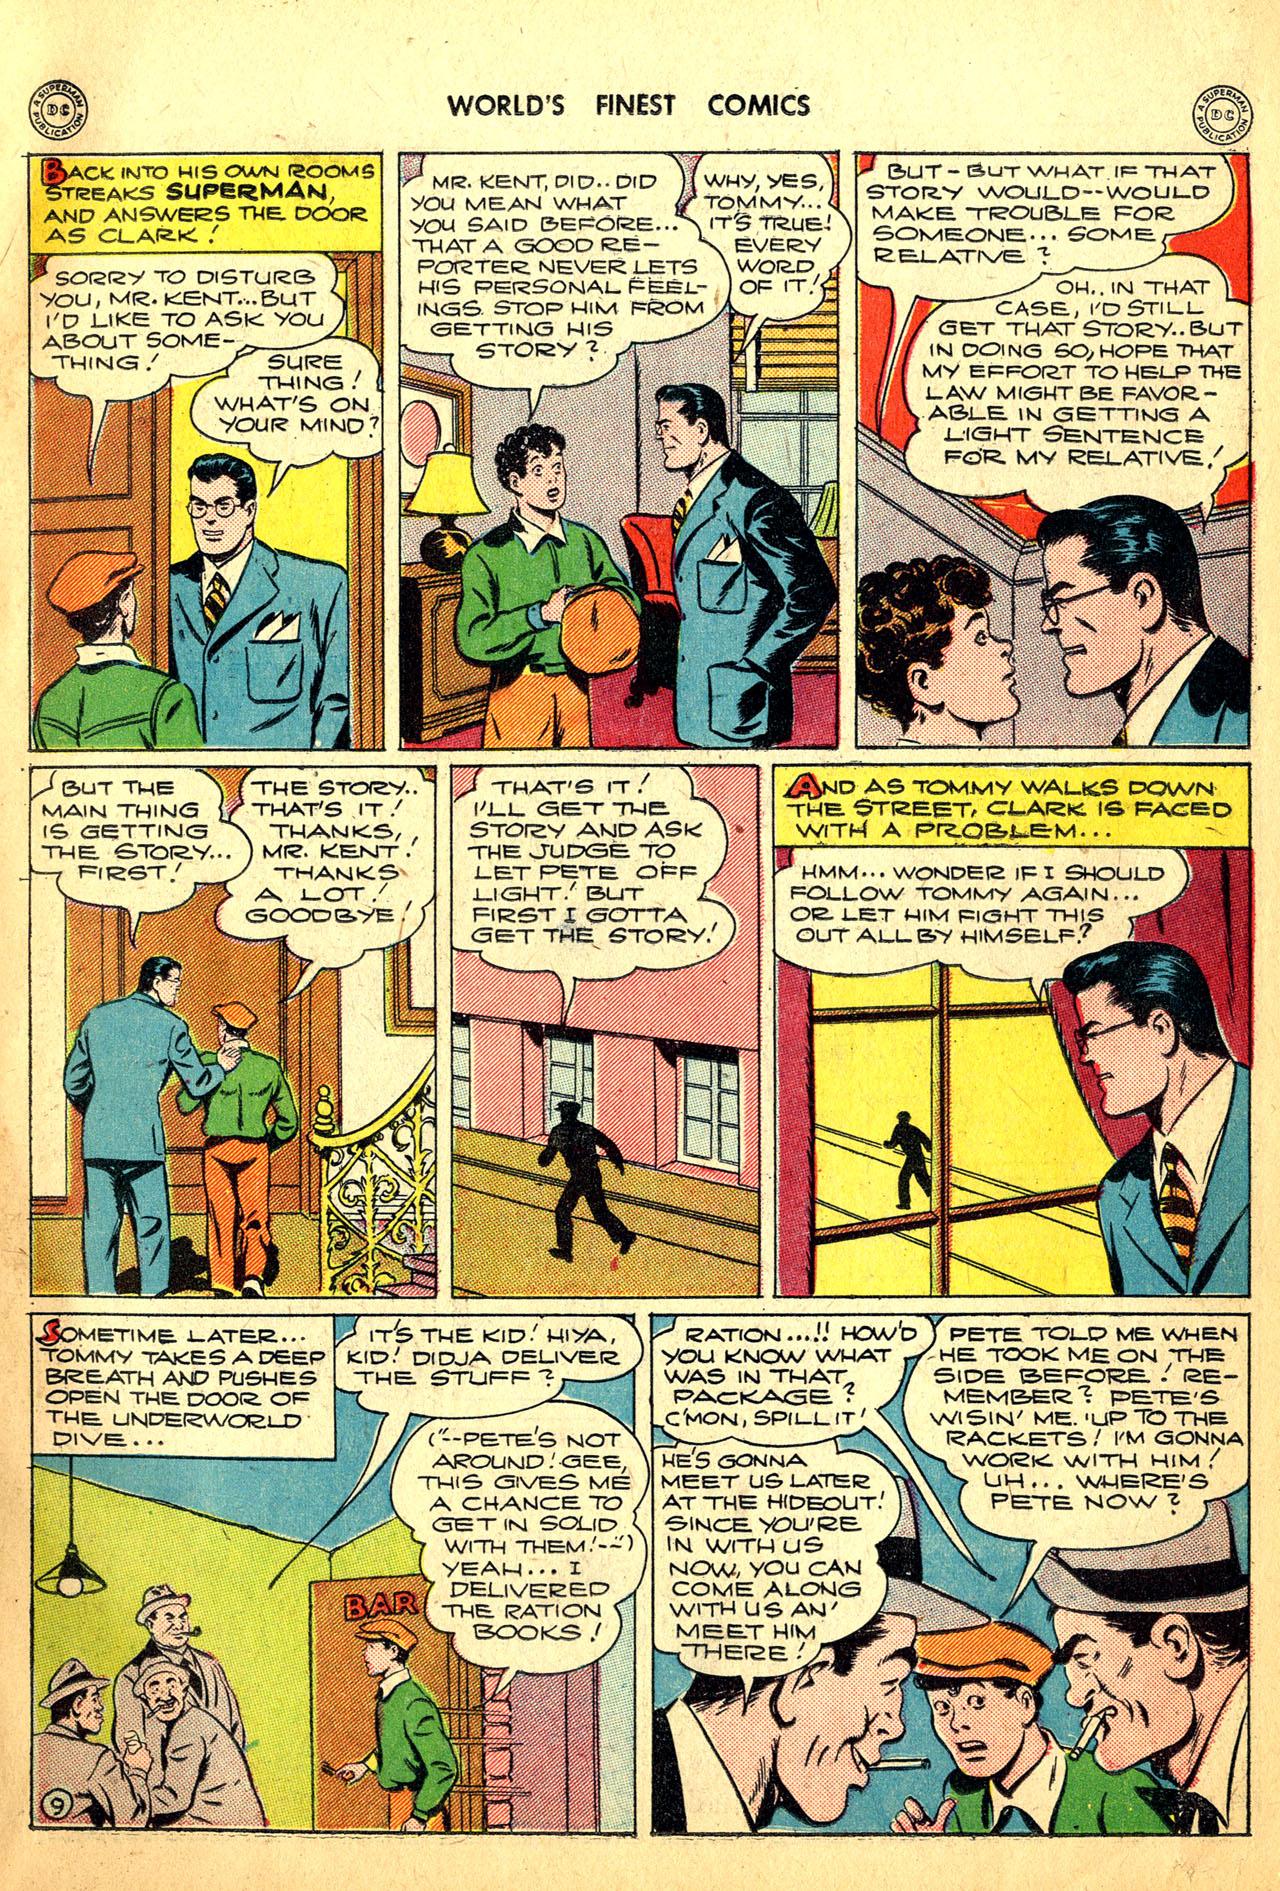 Read online World's Finest Comics comic -  Issue #18 - 11